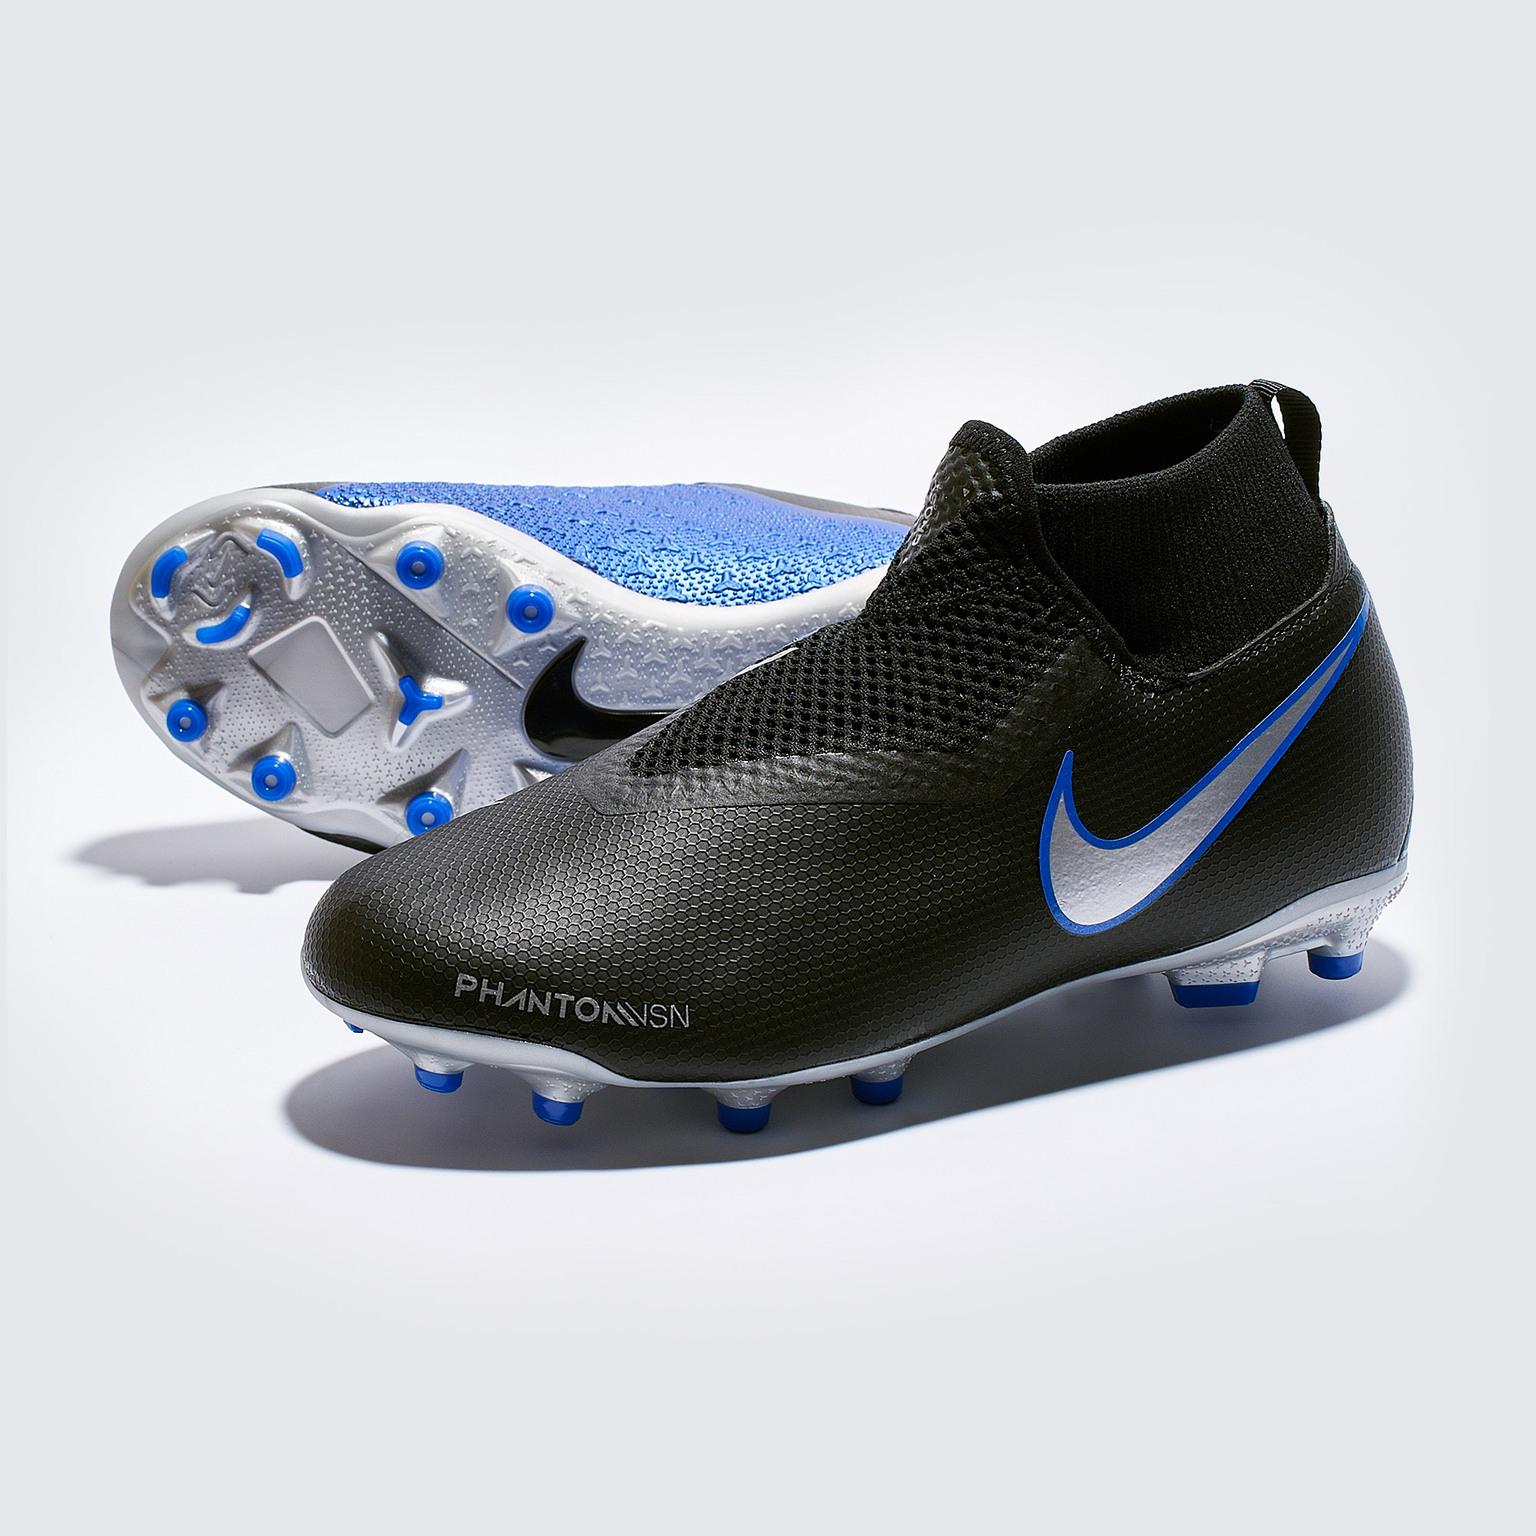 Бутсы детские Nike Pantom Vision Academy DF FG/MG AO3287-004 nike бутсы мужские nike vapor 12 club cr7 mg